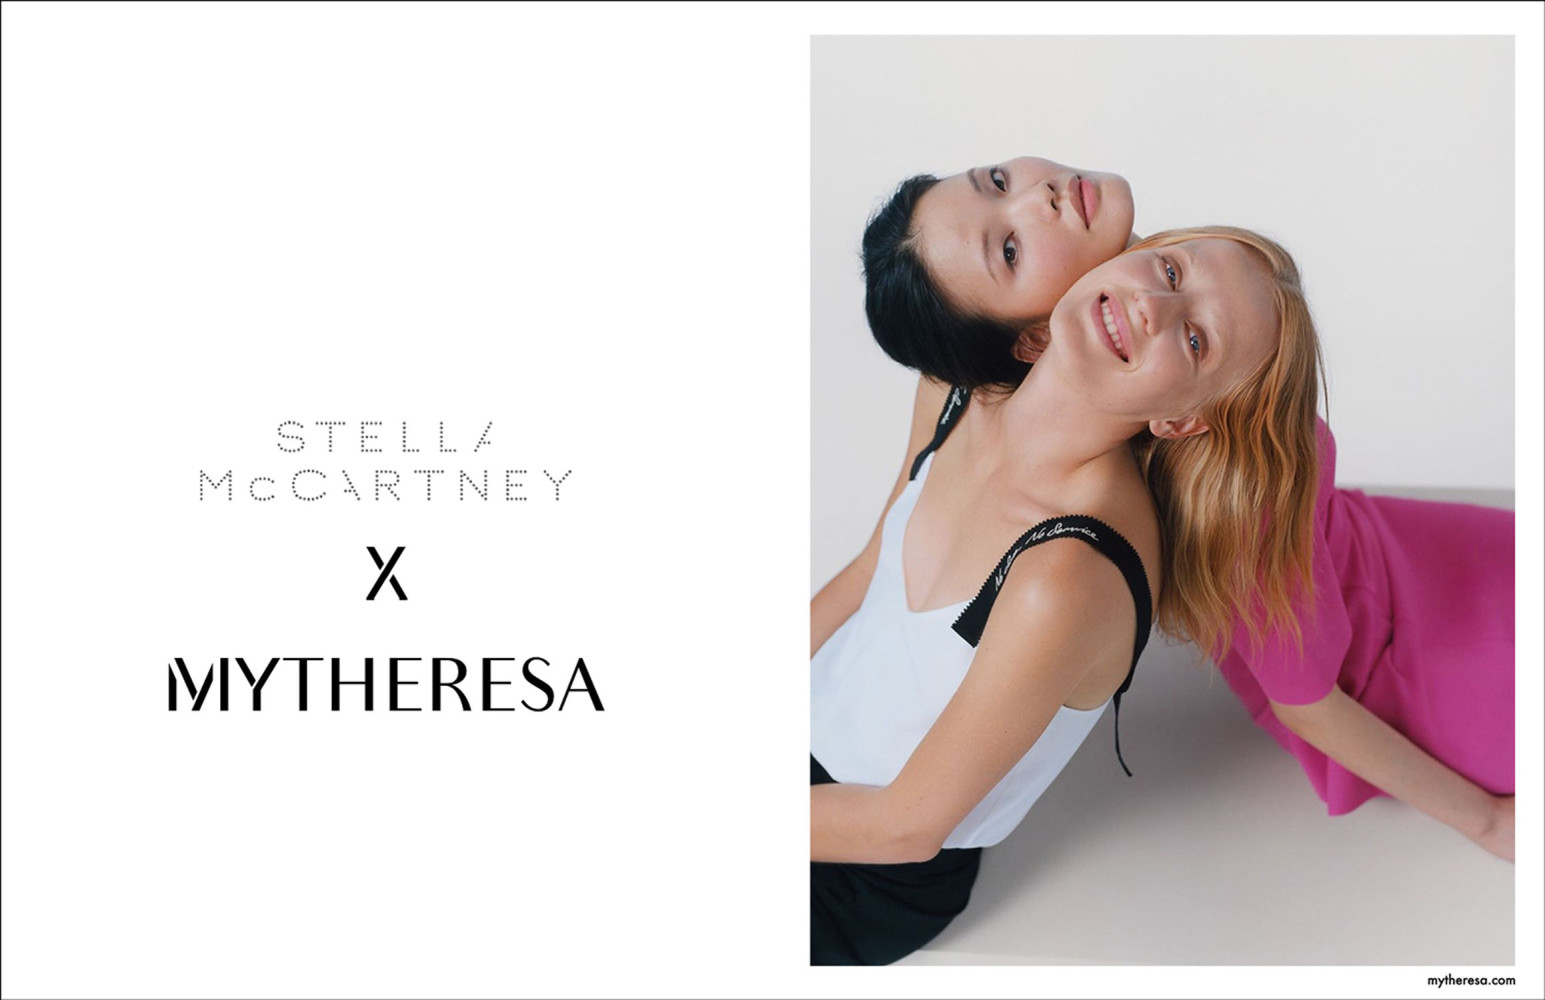 STELLA MCCARTNEY X MYTHERESA